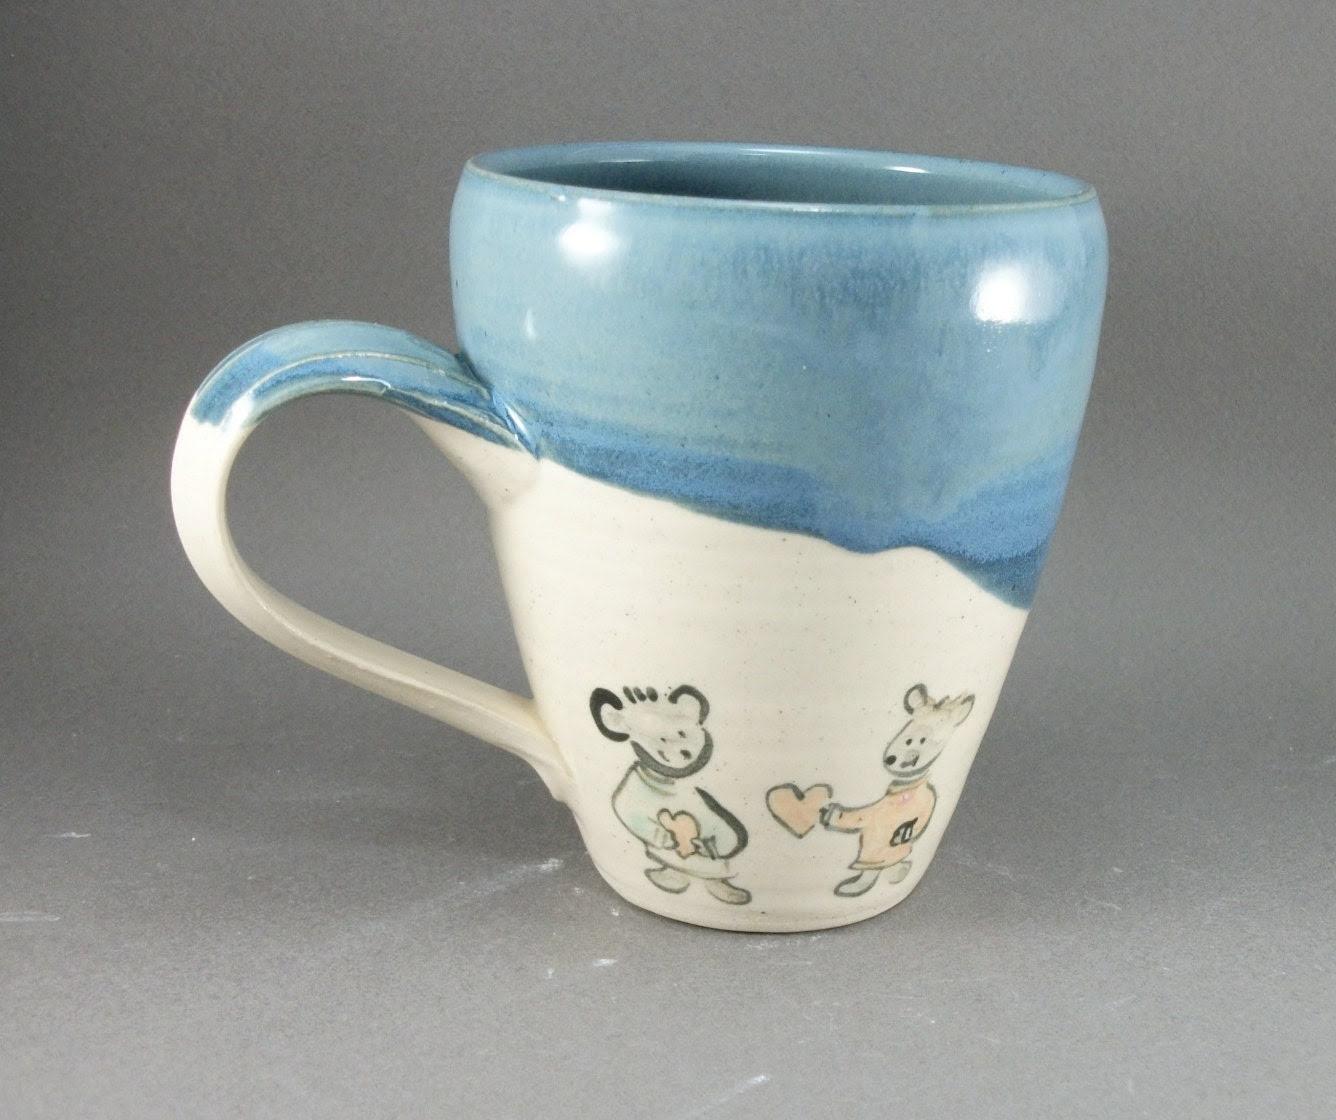 teddy bears and hearts mug